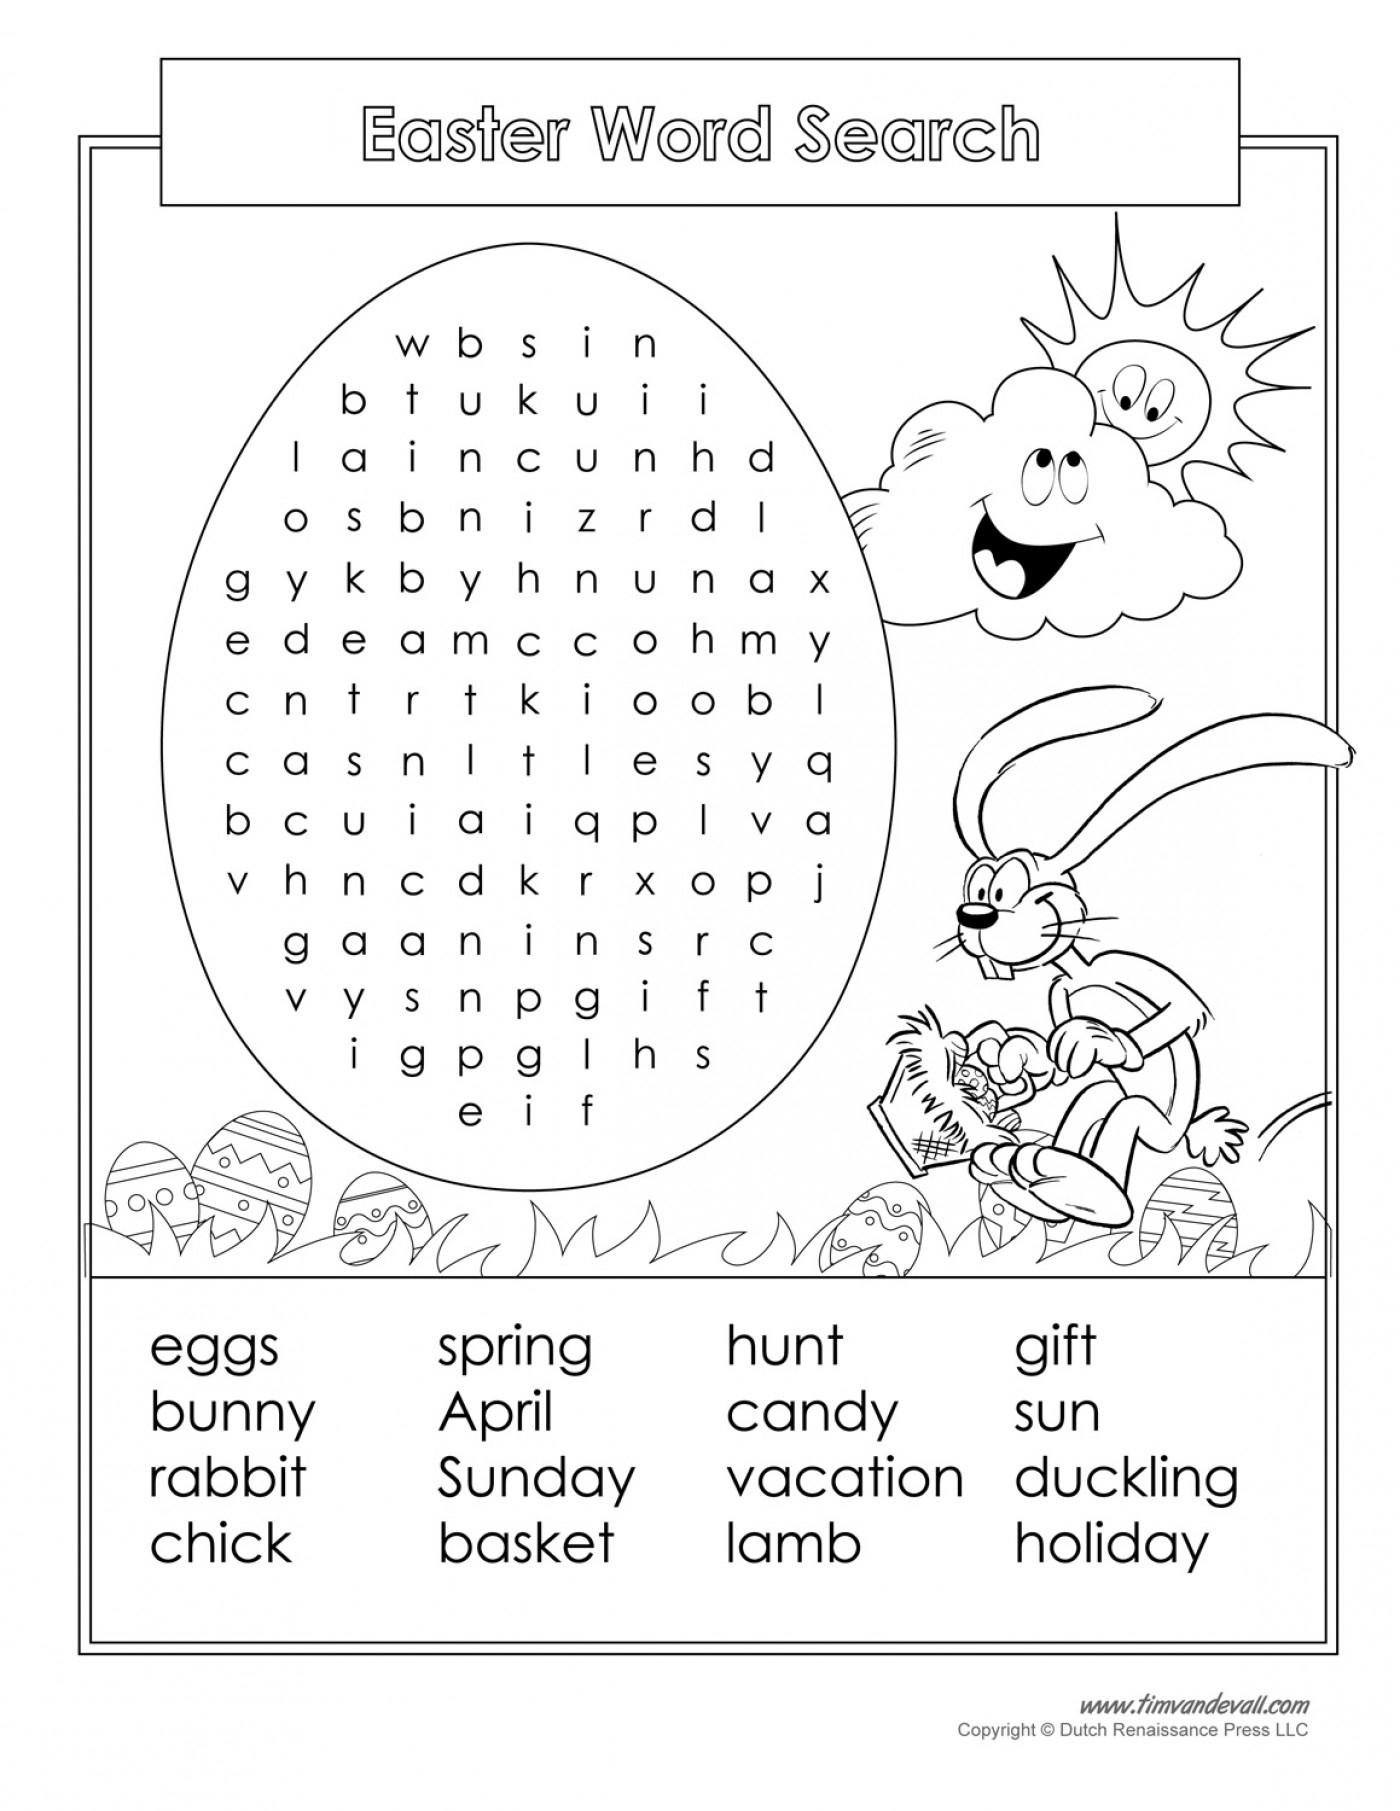 Easter Crossword Puzzle Printable Crosswords Free Word - Free - Printable Crossword Easter